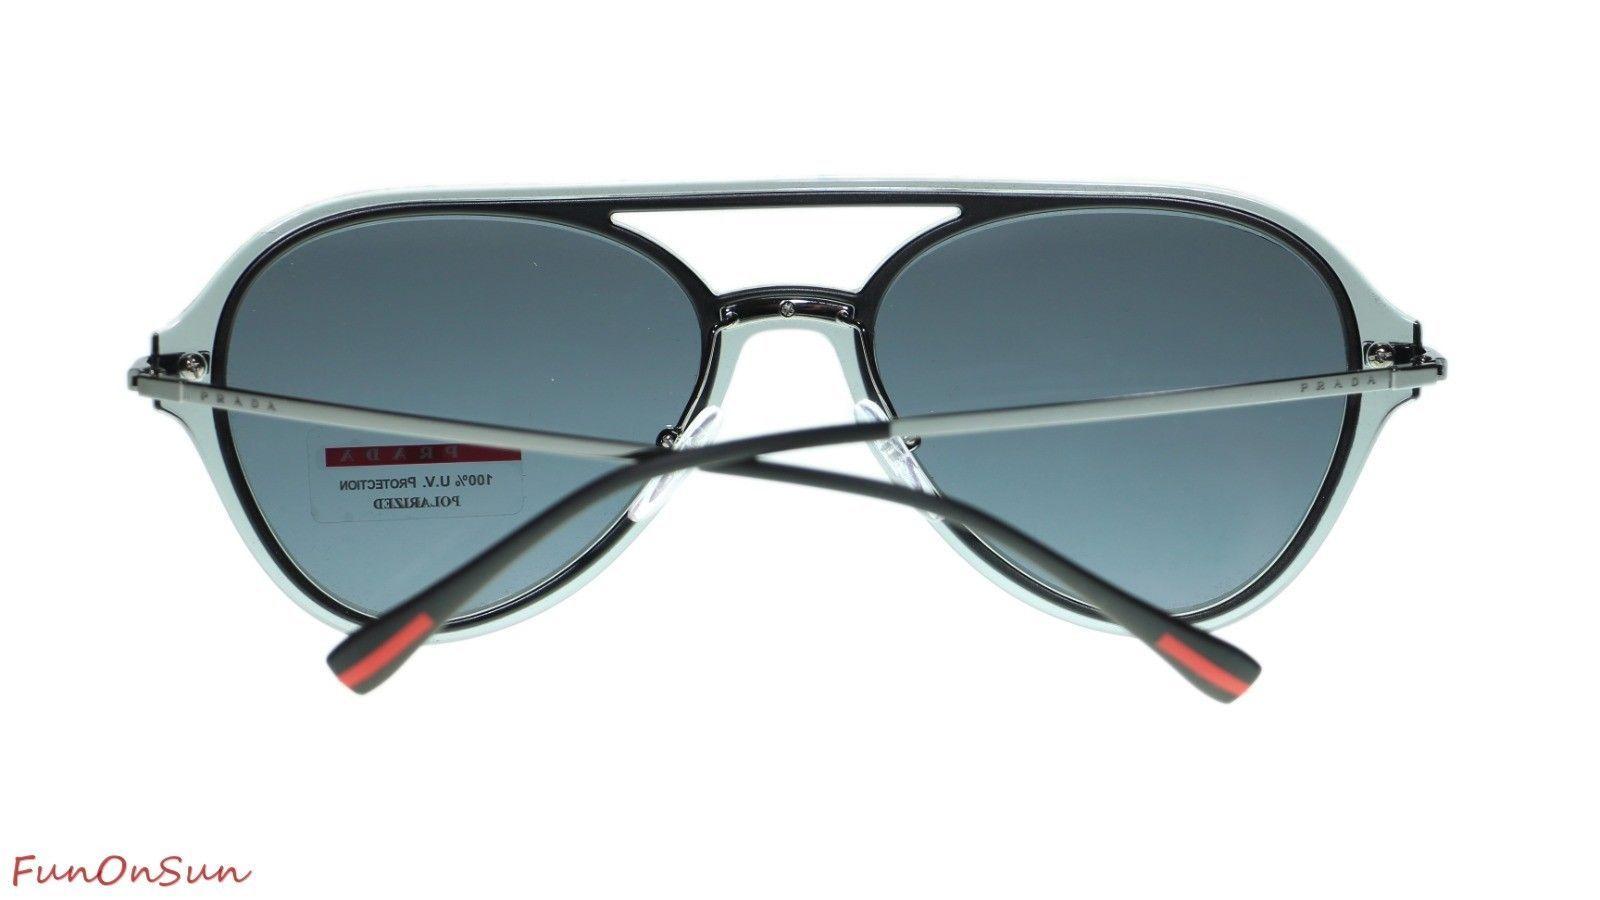 Prada Men Sunglasses PS04TS P2X5Z1 Grey/Polar Grey Polarized Lens 57mm image 4